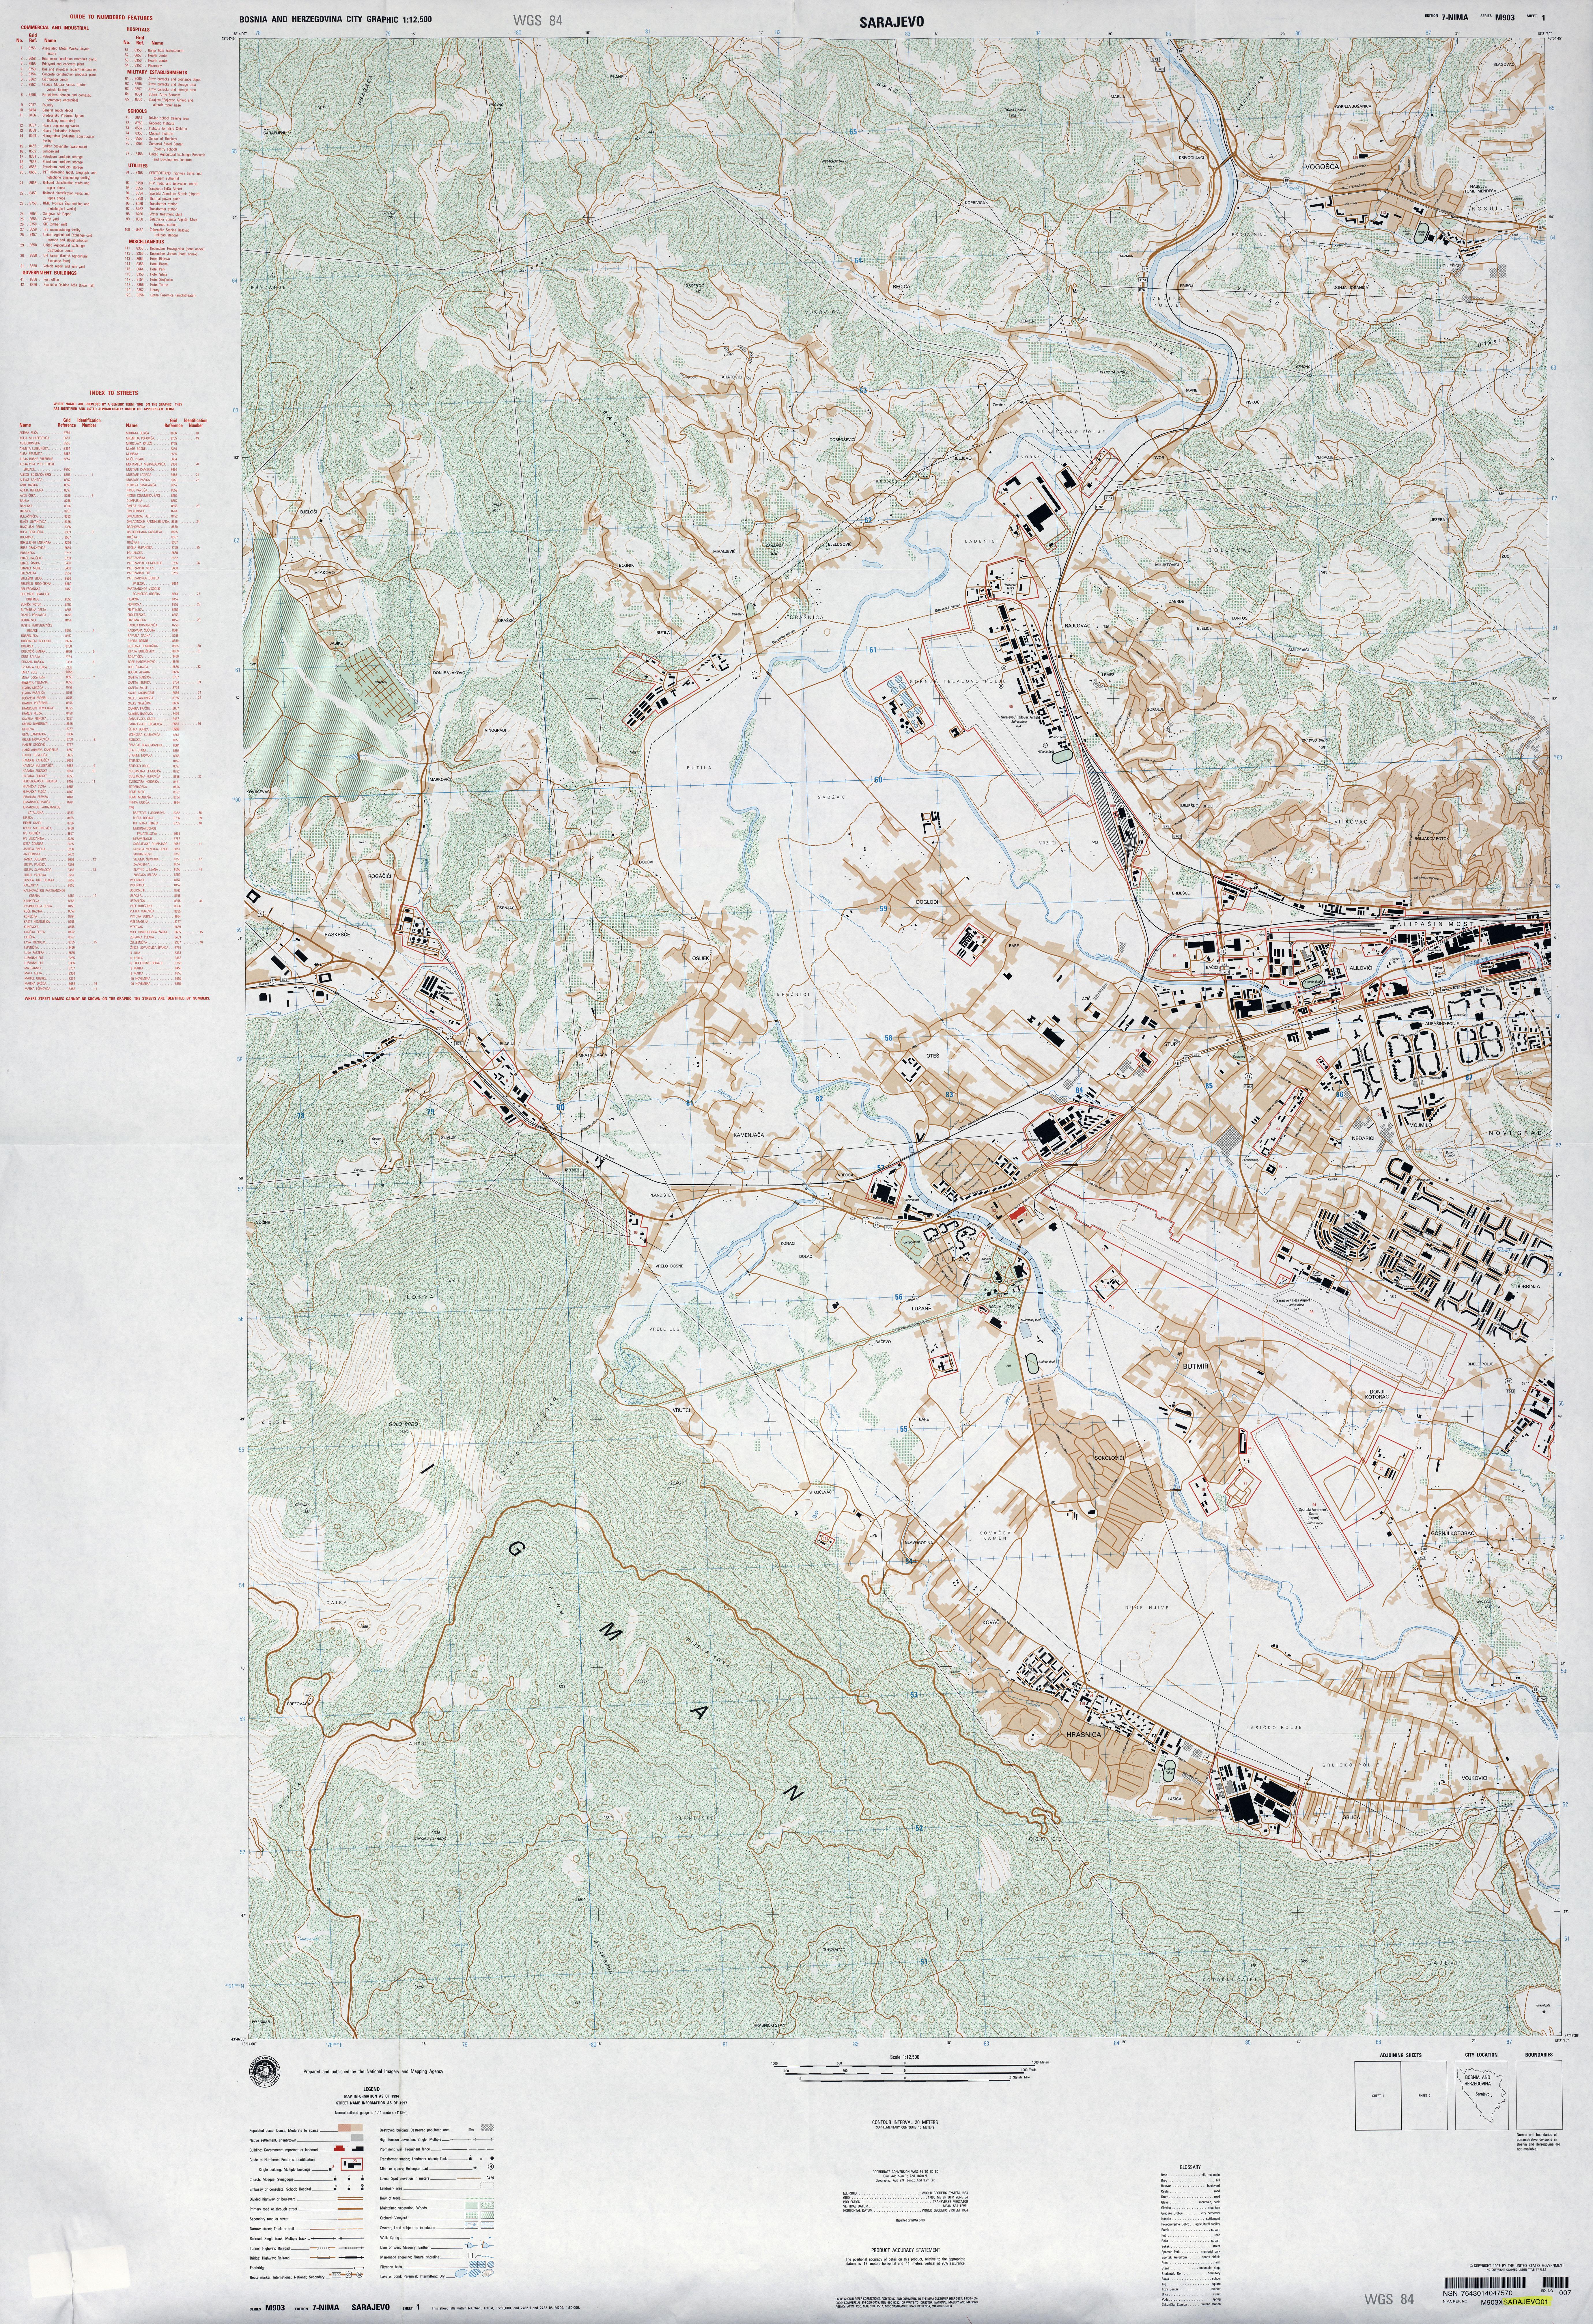 Bosnia Maps - Perry-Castañeda Map Collection - UT Liry Online on istanbul map, gibraltar on map, budapest map, bosnia map, belgrade map, vienna map, bosnia and herzegovina, dublin map, serbia map, kosovo map, constantinople map, zagreb map, croatia map, balkans map, minsk map, gavrilo princip, siege of sarajevo, kiev map, yugoslavia map, skopje map, the hague map, tirana map, riga map, bosnian war,